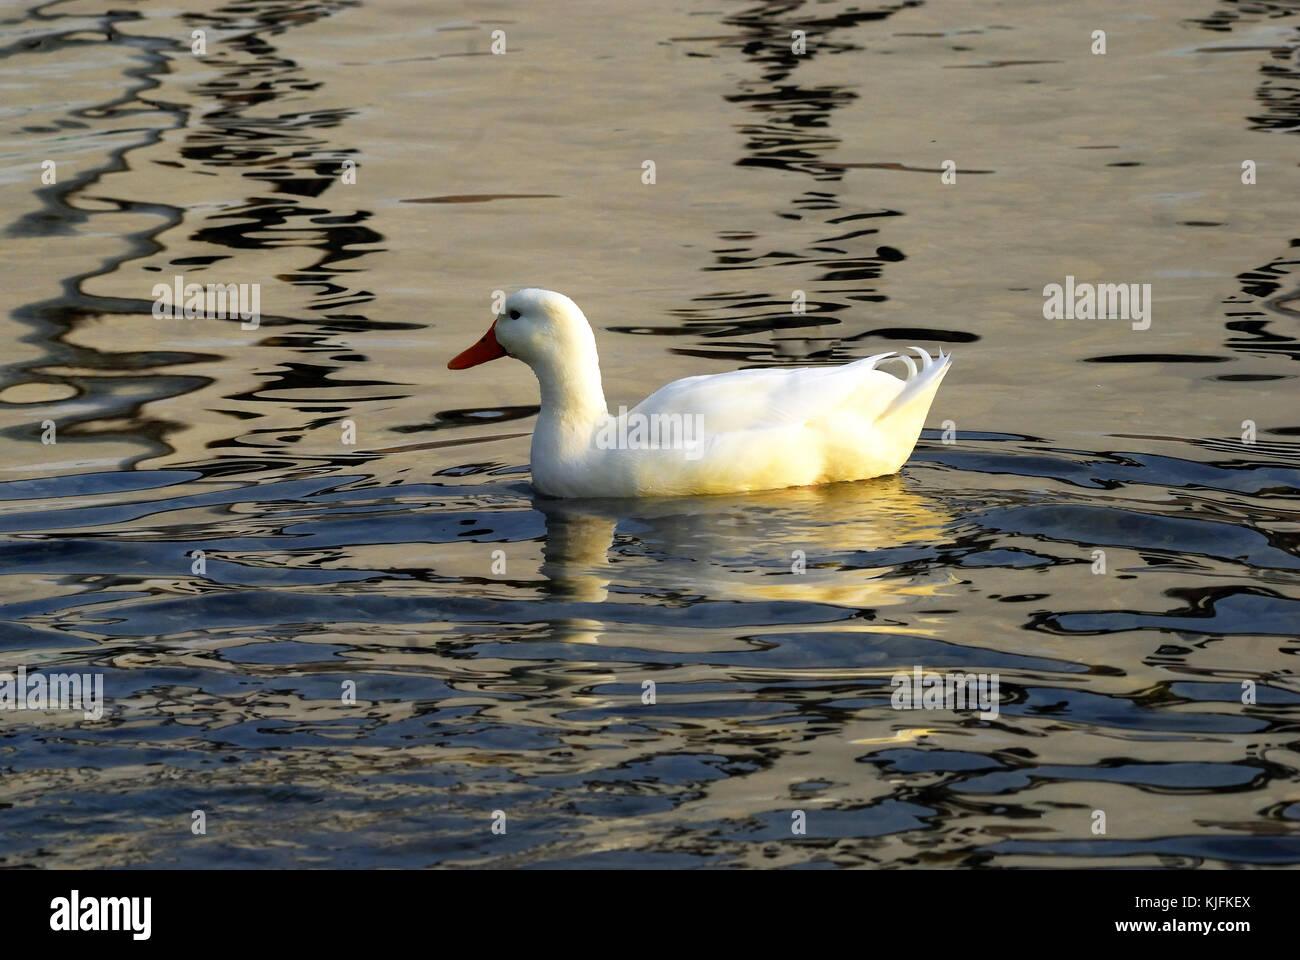 The Pekin or Peking, also White Pekin, is an American breed of domestic duck, reared principally for meat. - Stock Image